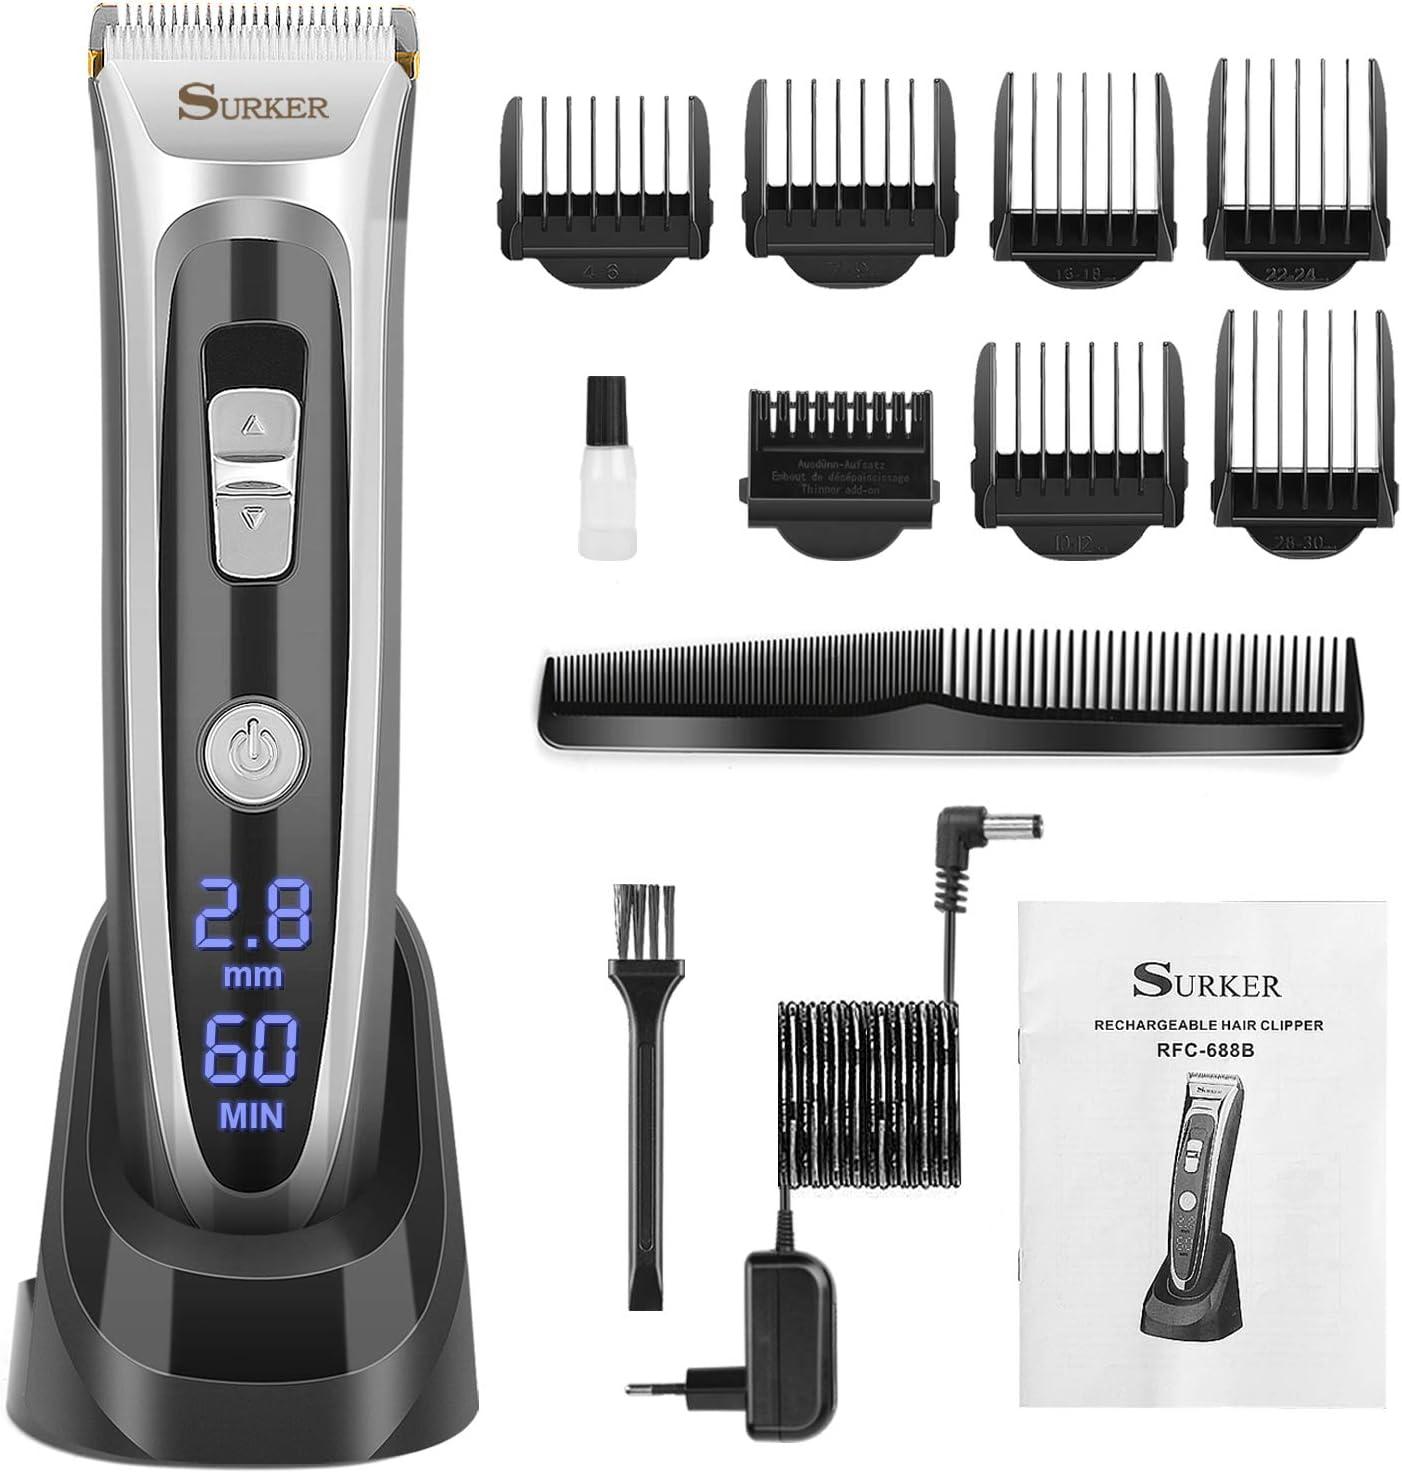 Máquina de Cortar Pelo, Recortador de Barba, Cuchillas de Cerámica, Recargable, 60 Min de uso sin Cable (Black)